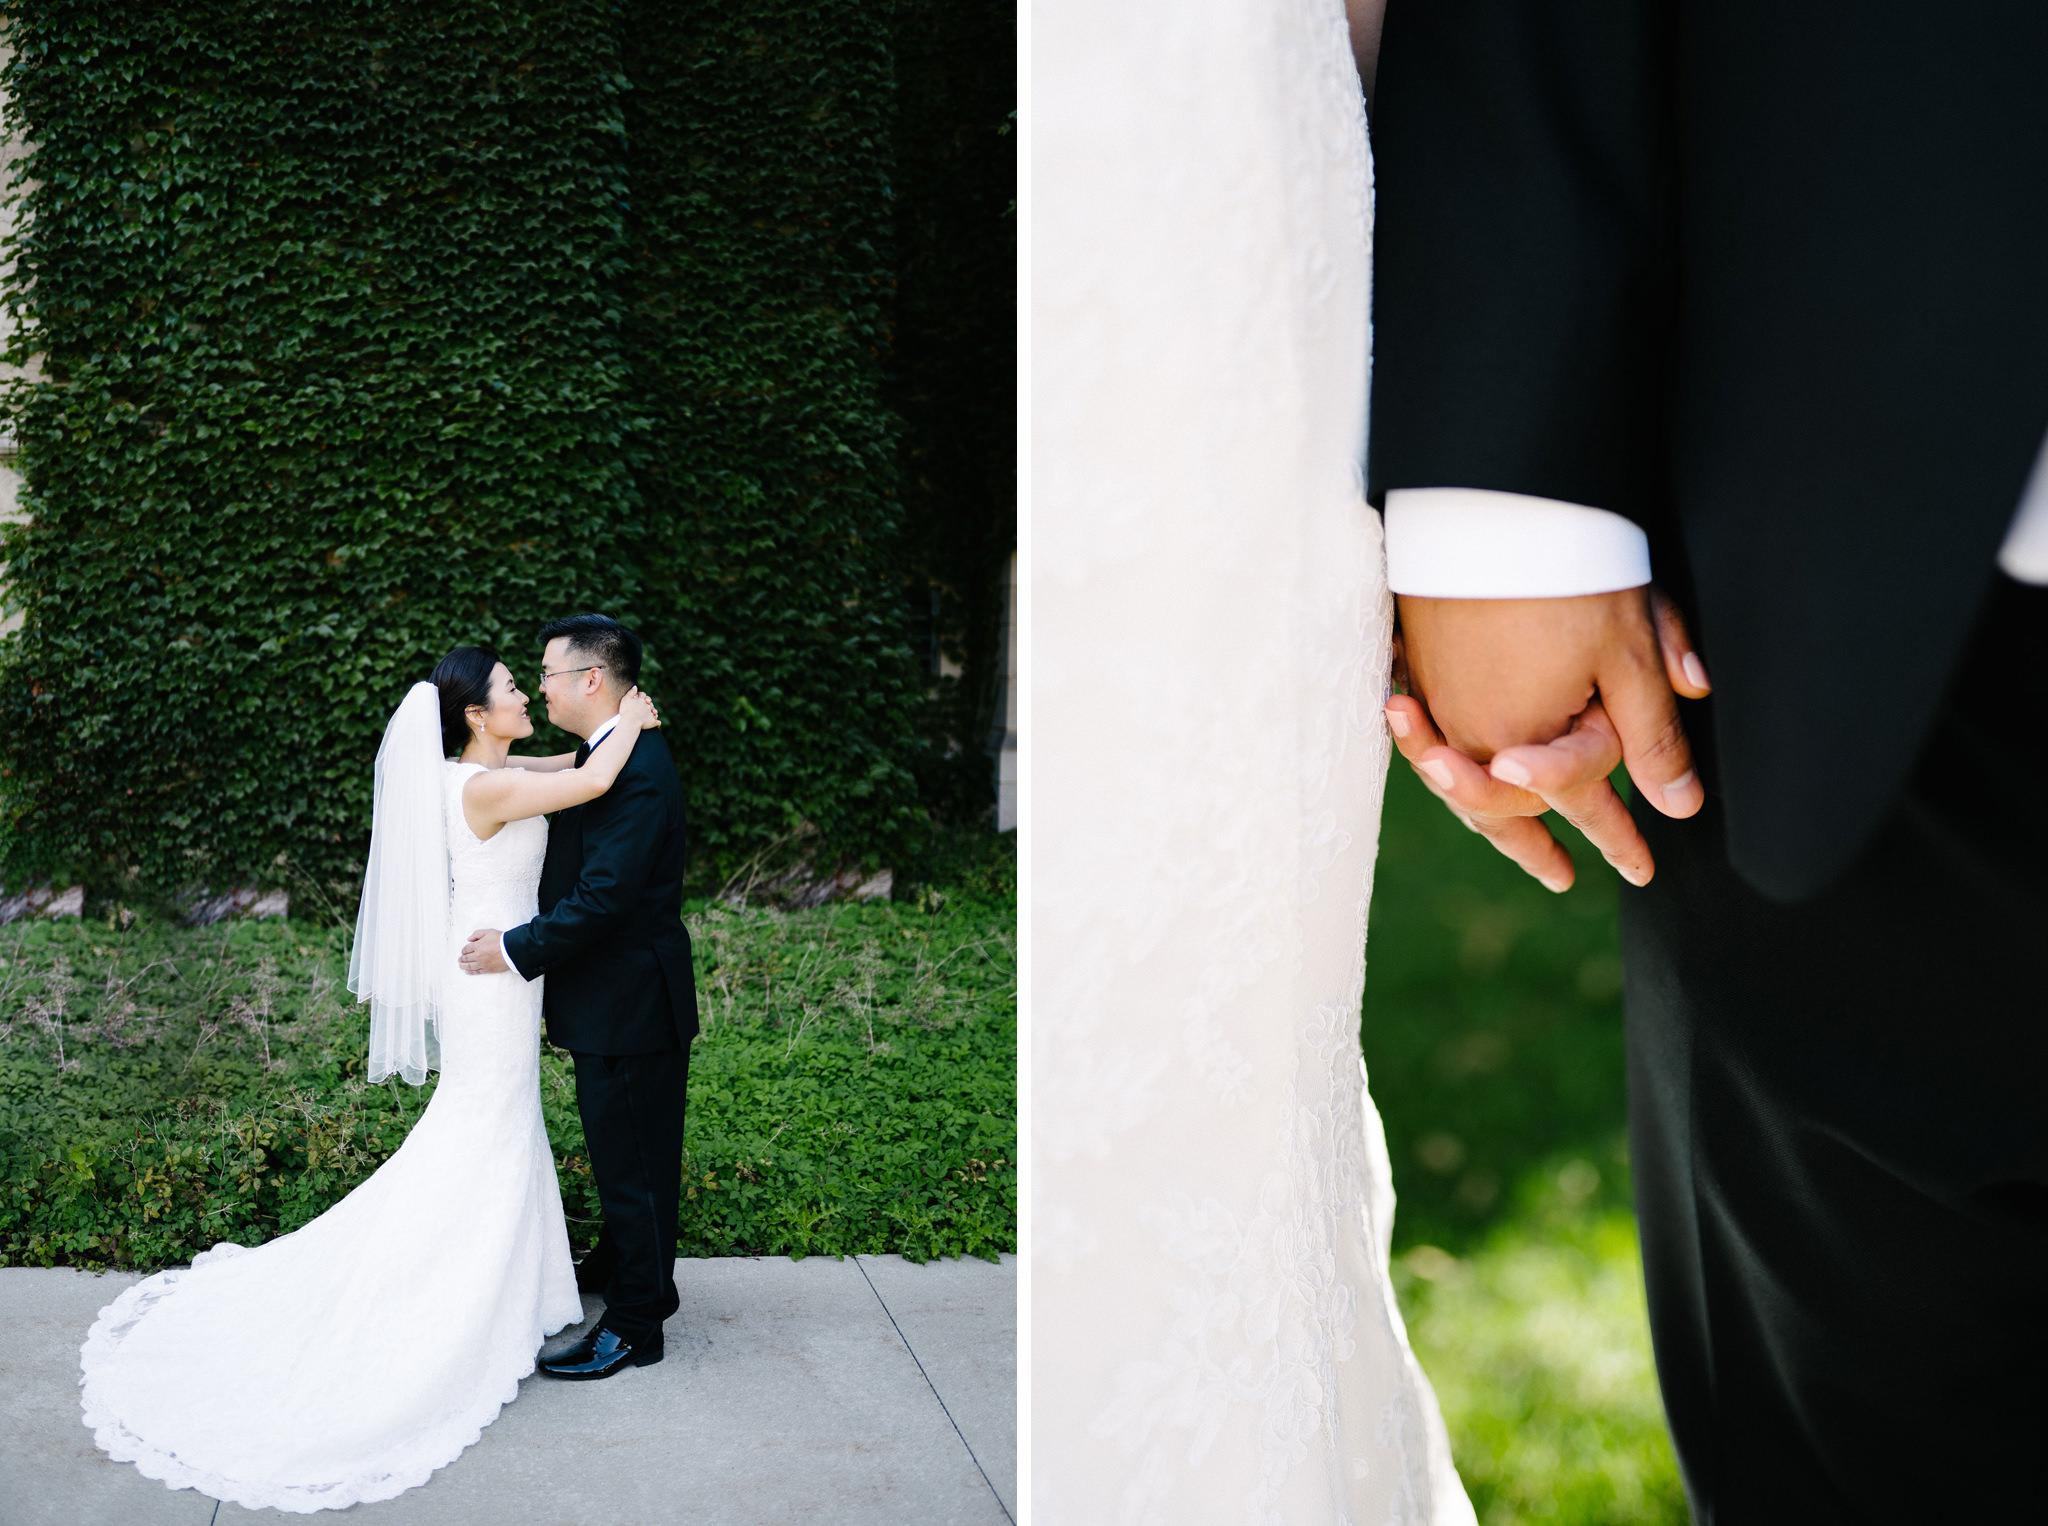 018-rempel-photography-chicago-wedding-inspiration-sara-philip-rockefeller-chapel-trump-tower.jpg